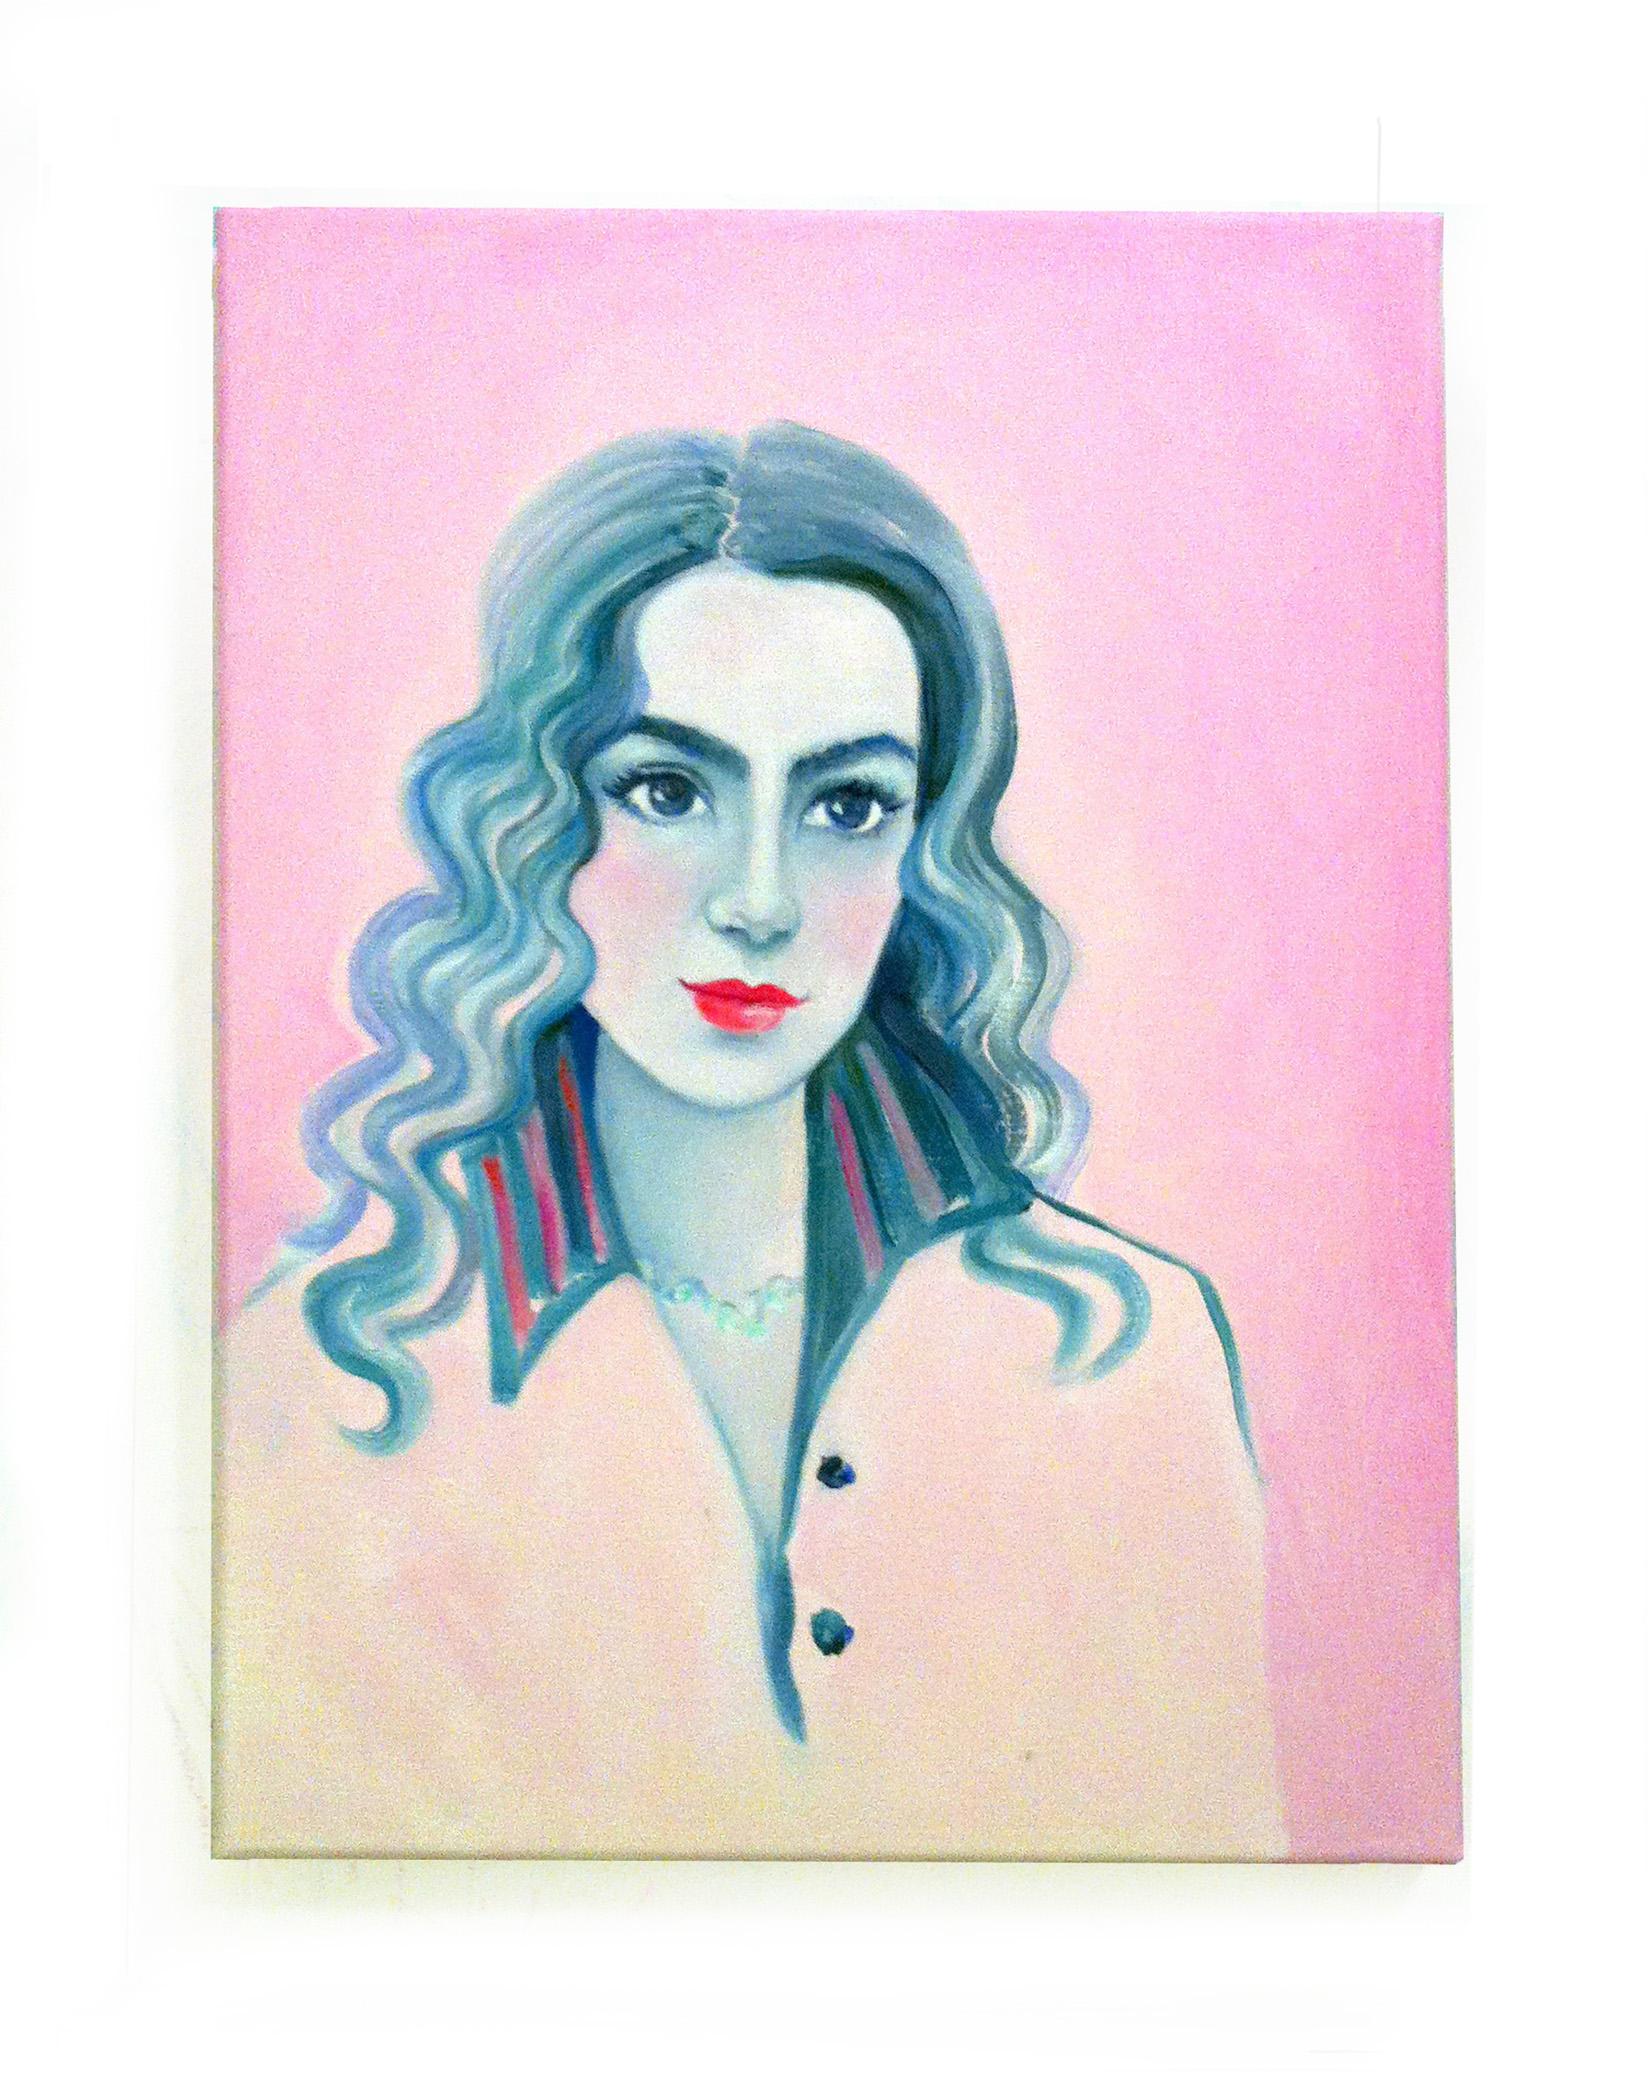 carlita, oil on canvas, 11 x 14 in. 2014